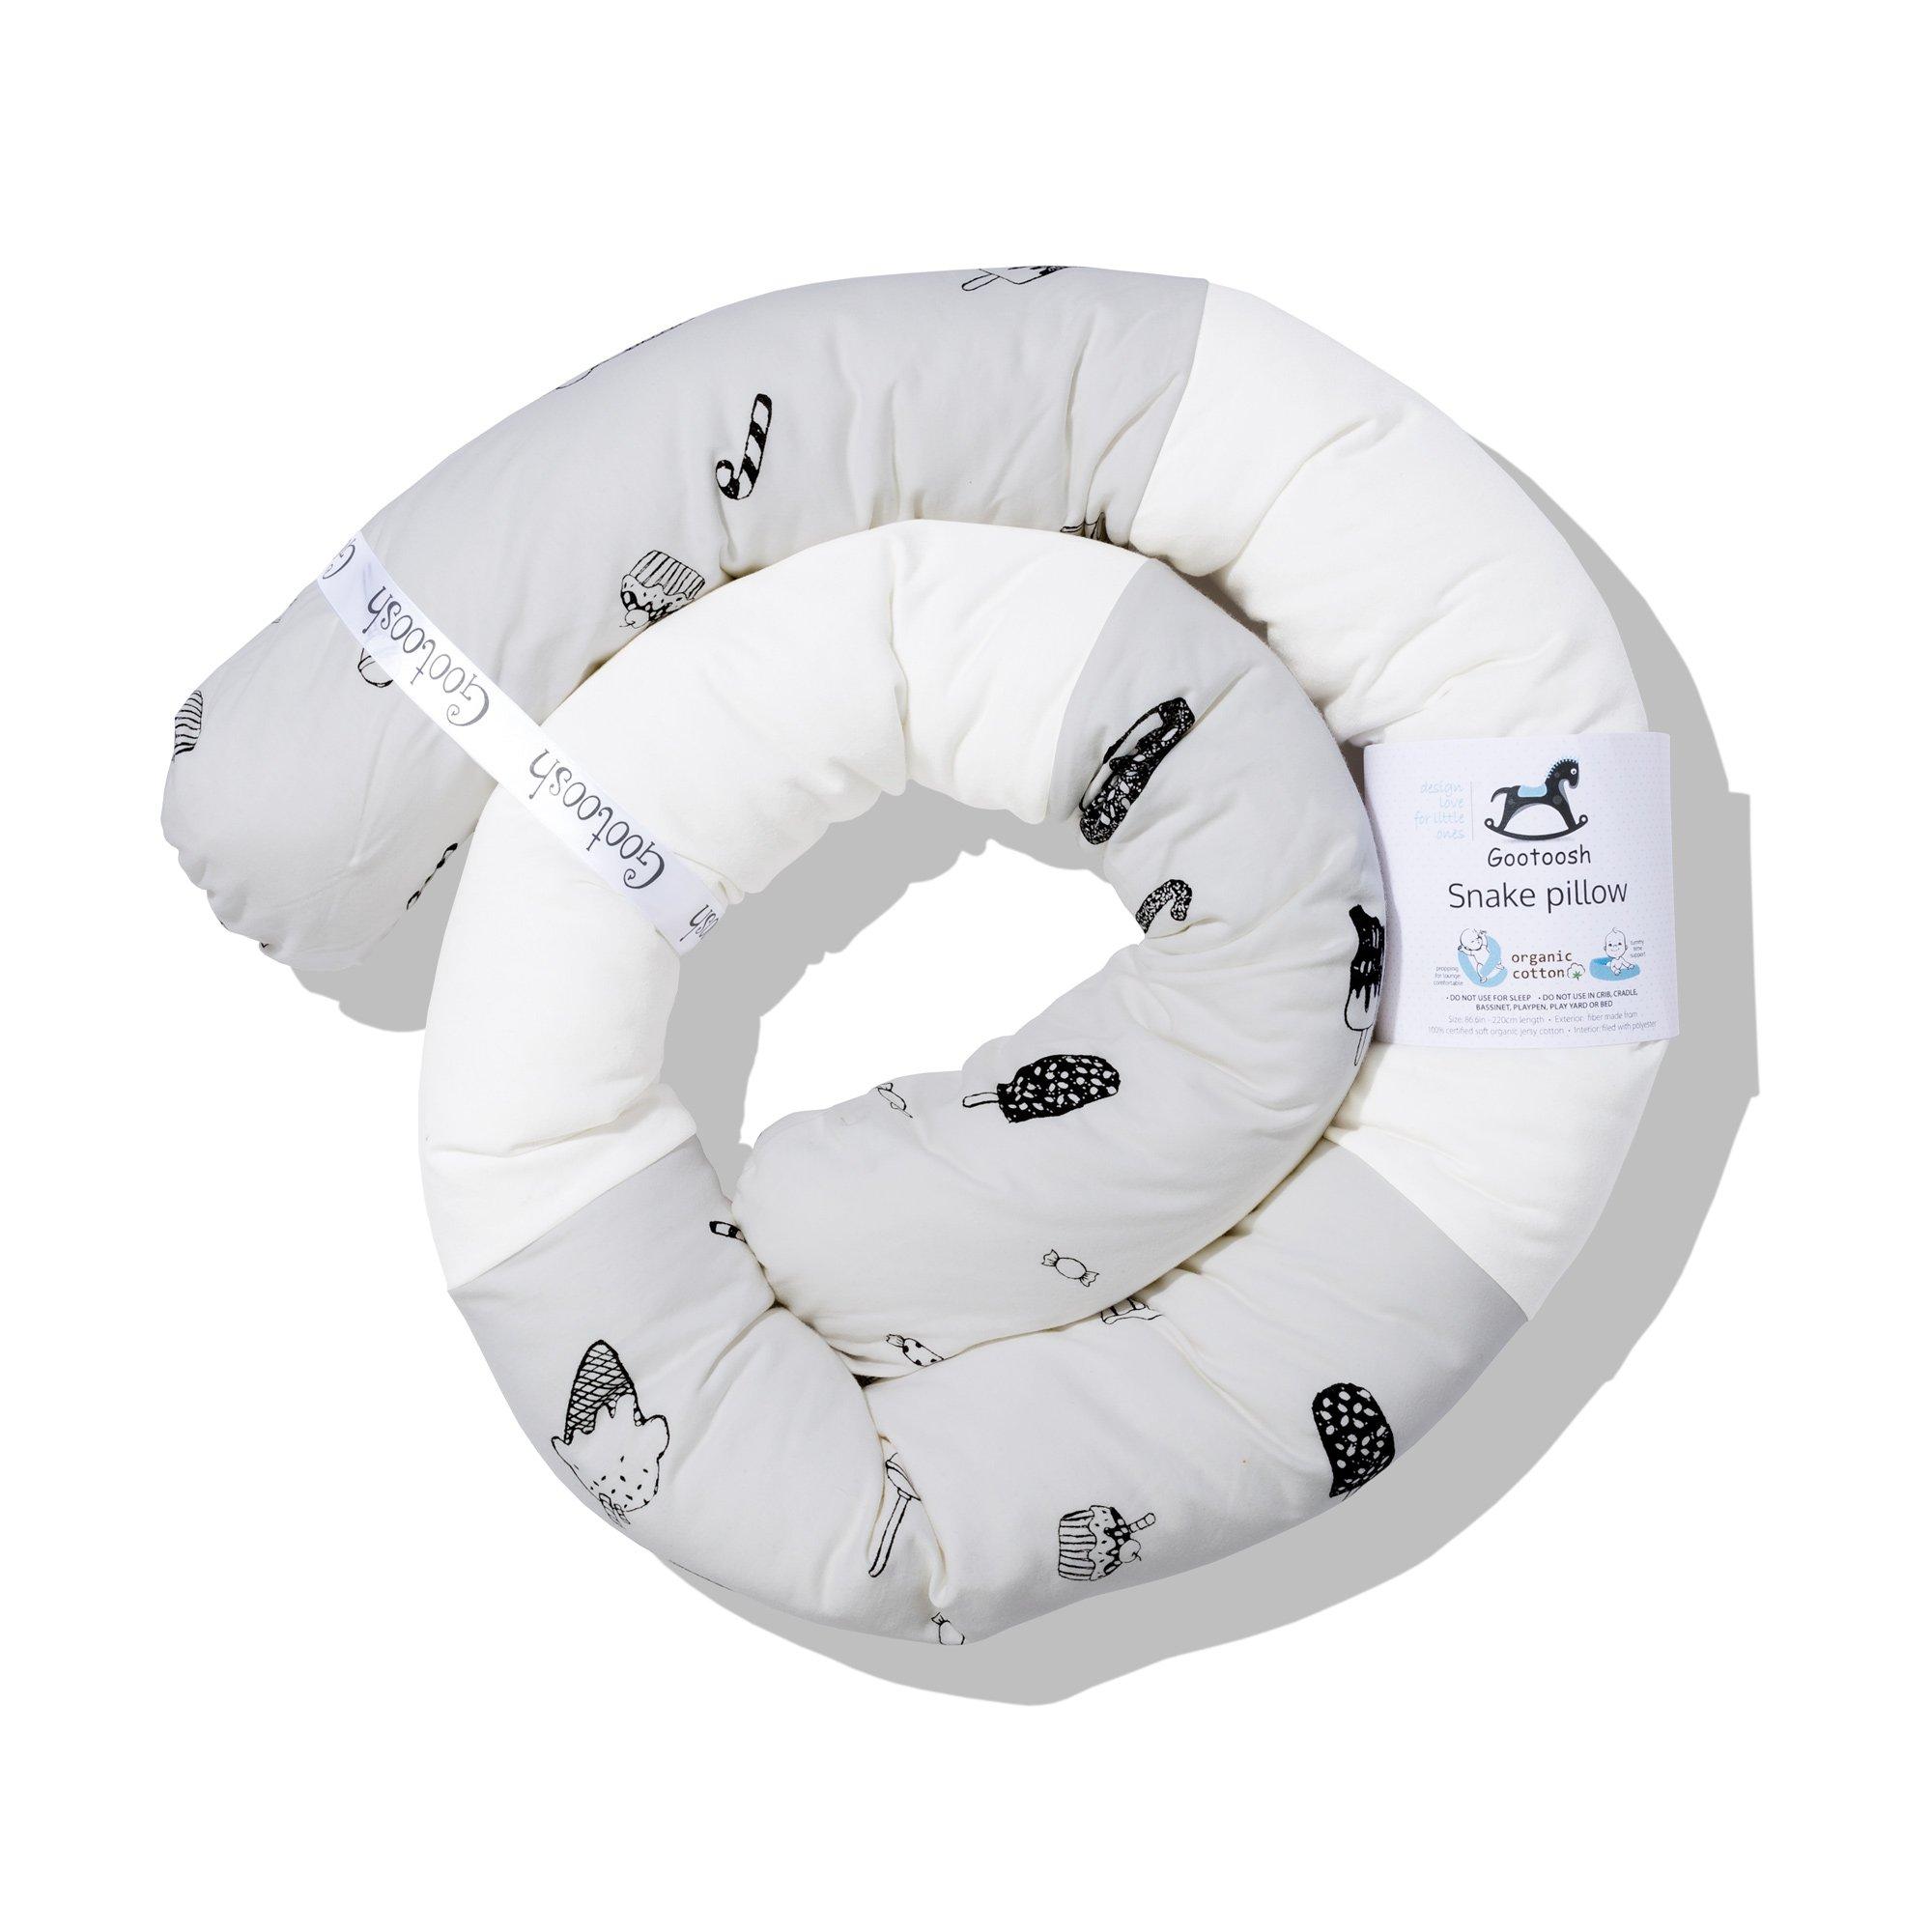 Snake Pillow with Zipper, Modern Bumper, Crib Bumper, Organic Cotton - Gray Candy/Origami 86 in